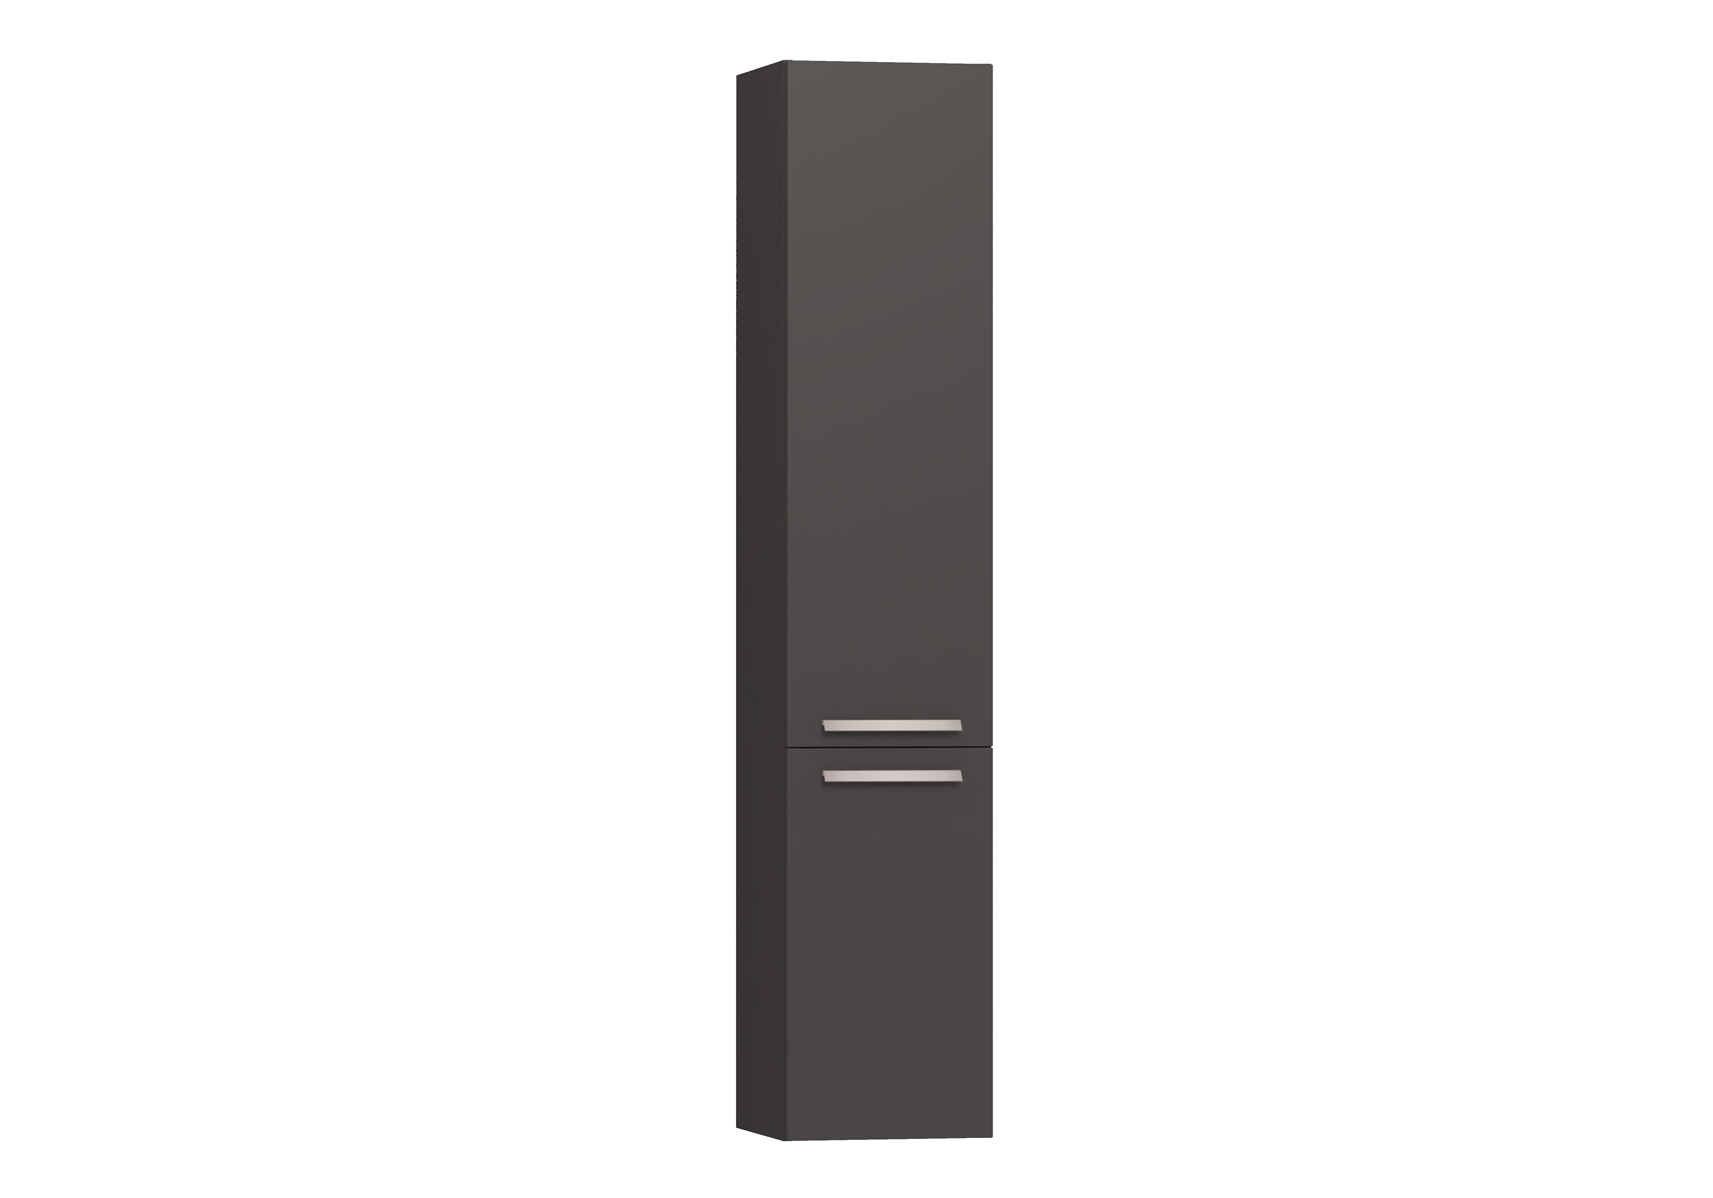 Integra armoire haute avec corbeille à linge, porte à droite, 35 cm, anthraciteacite haute brillance